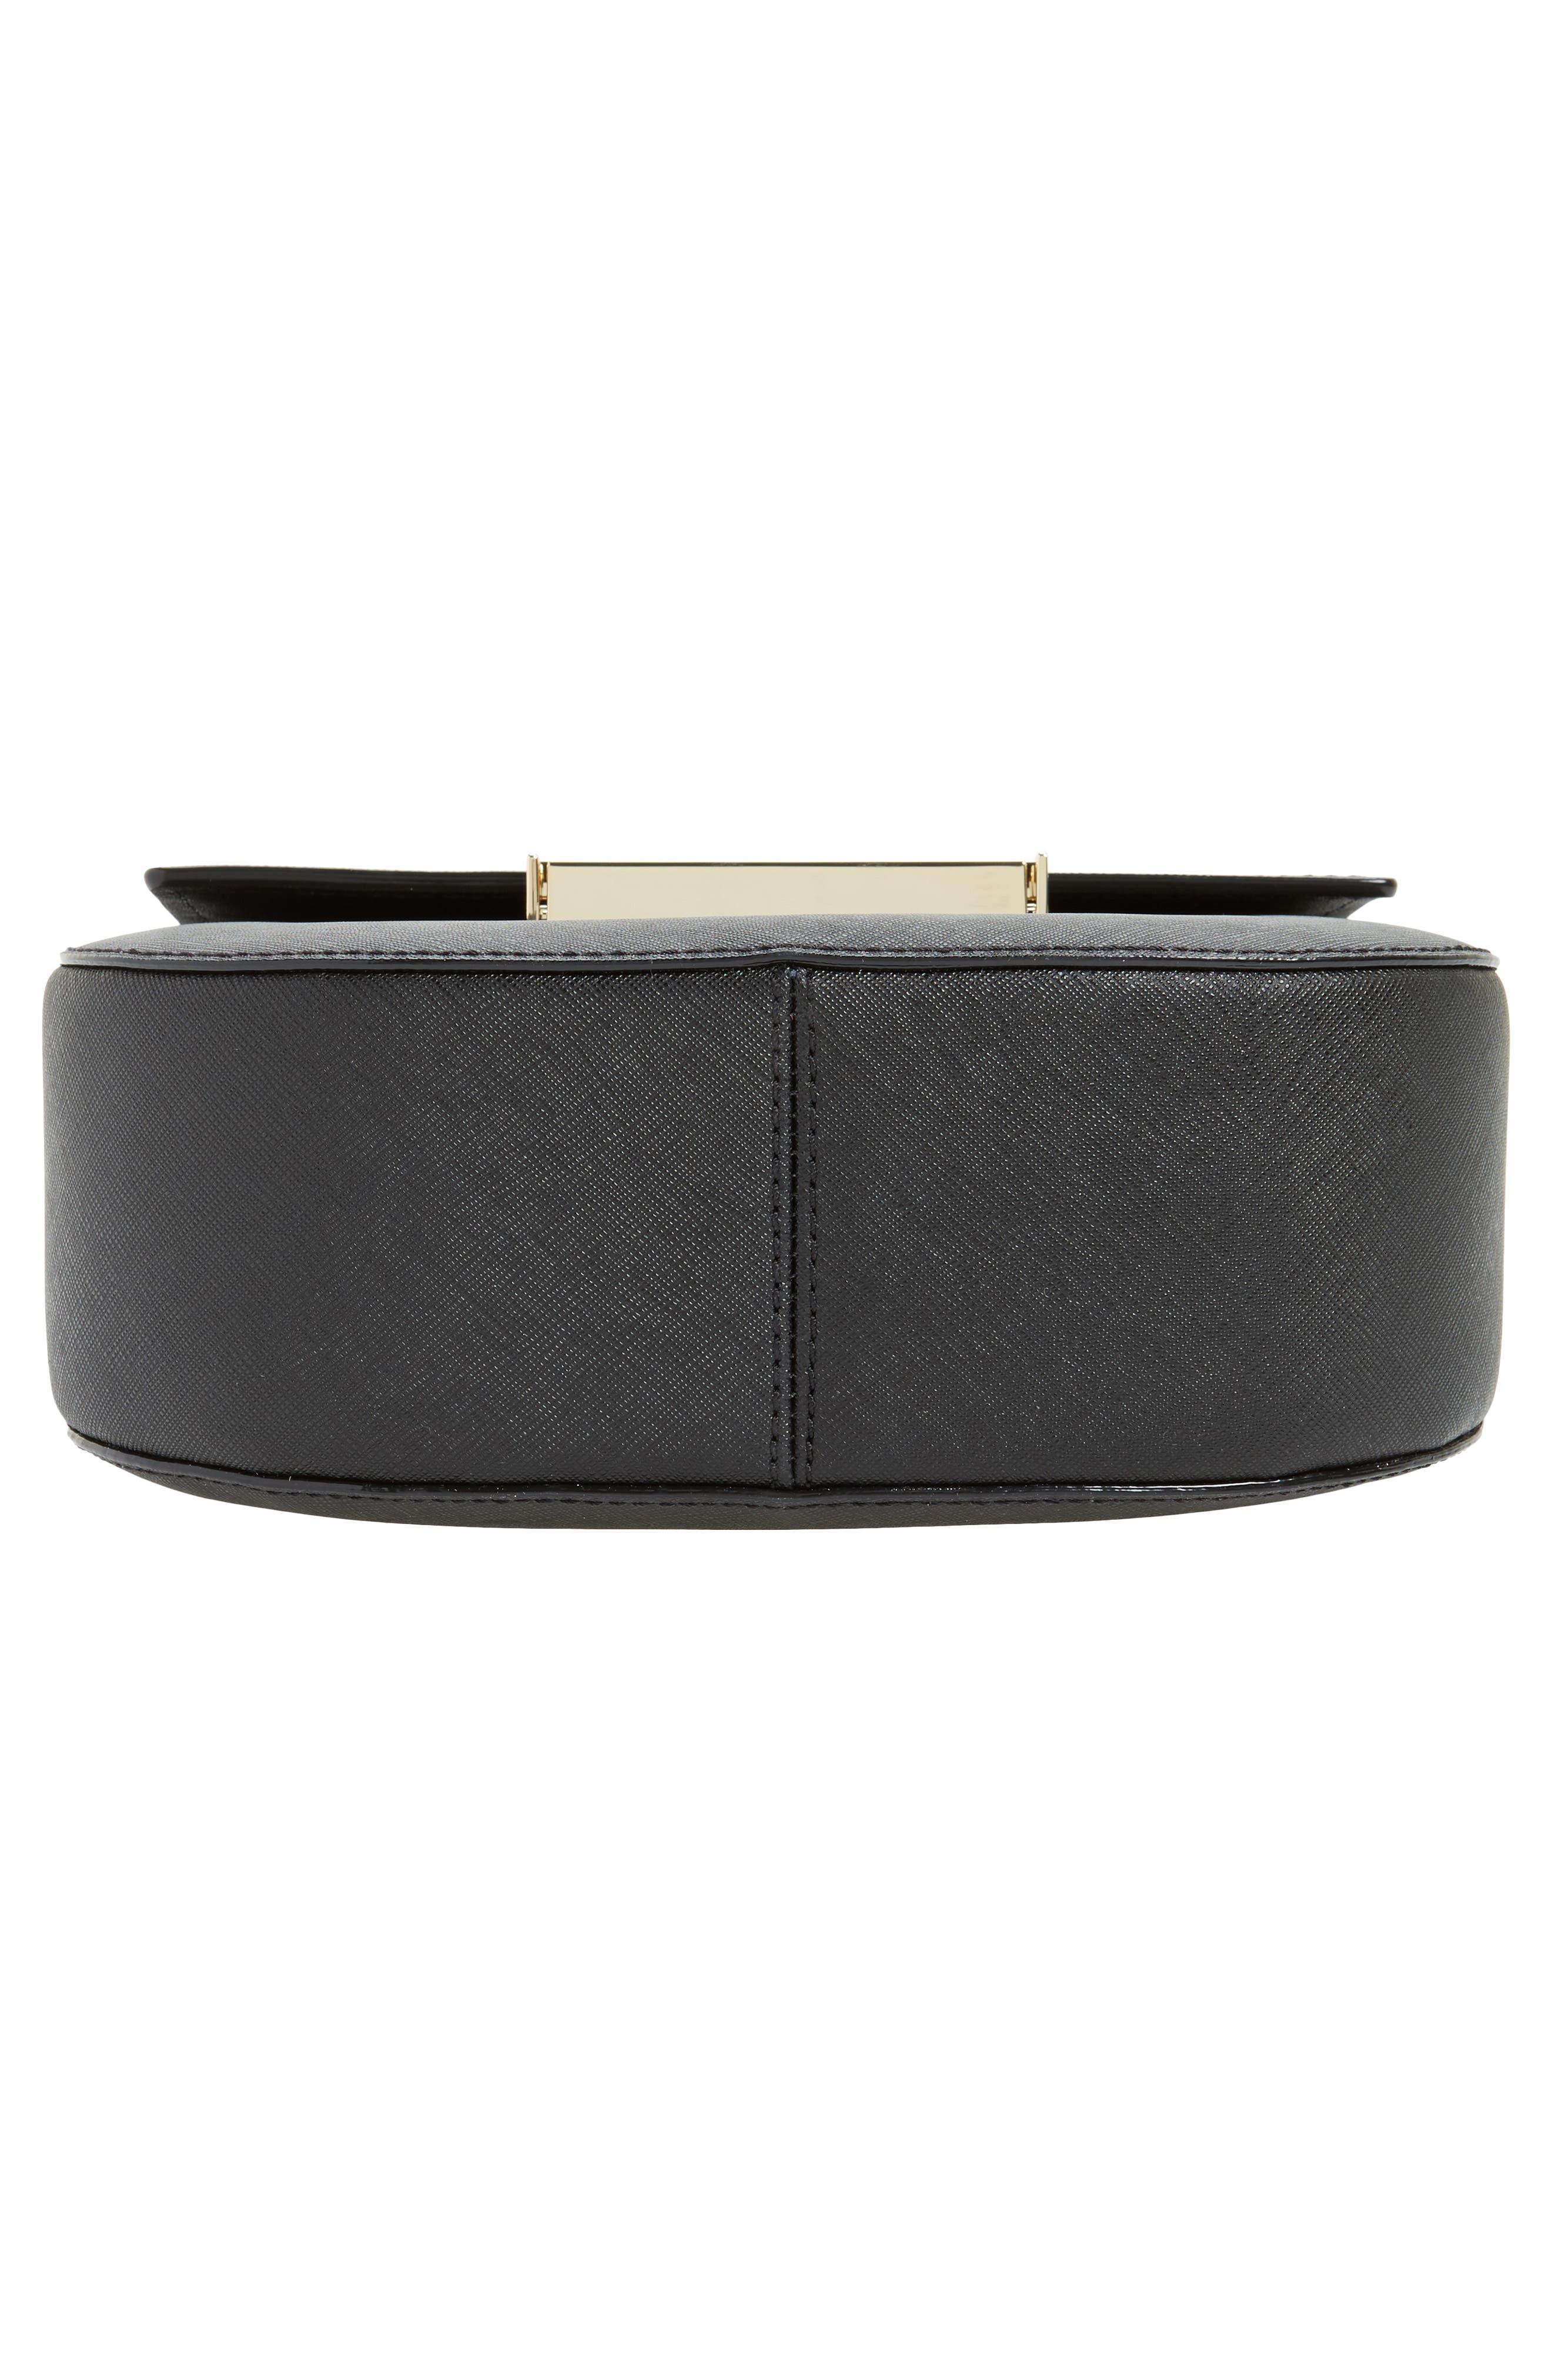 make it mine - byrdie leather saddle bag,                             Alternate thumbnail 5, color,                             Black